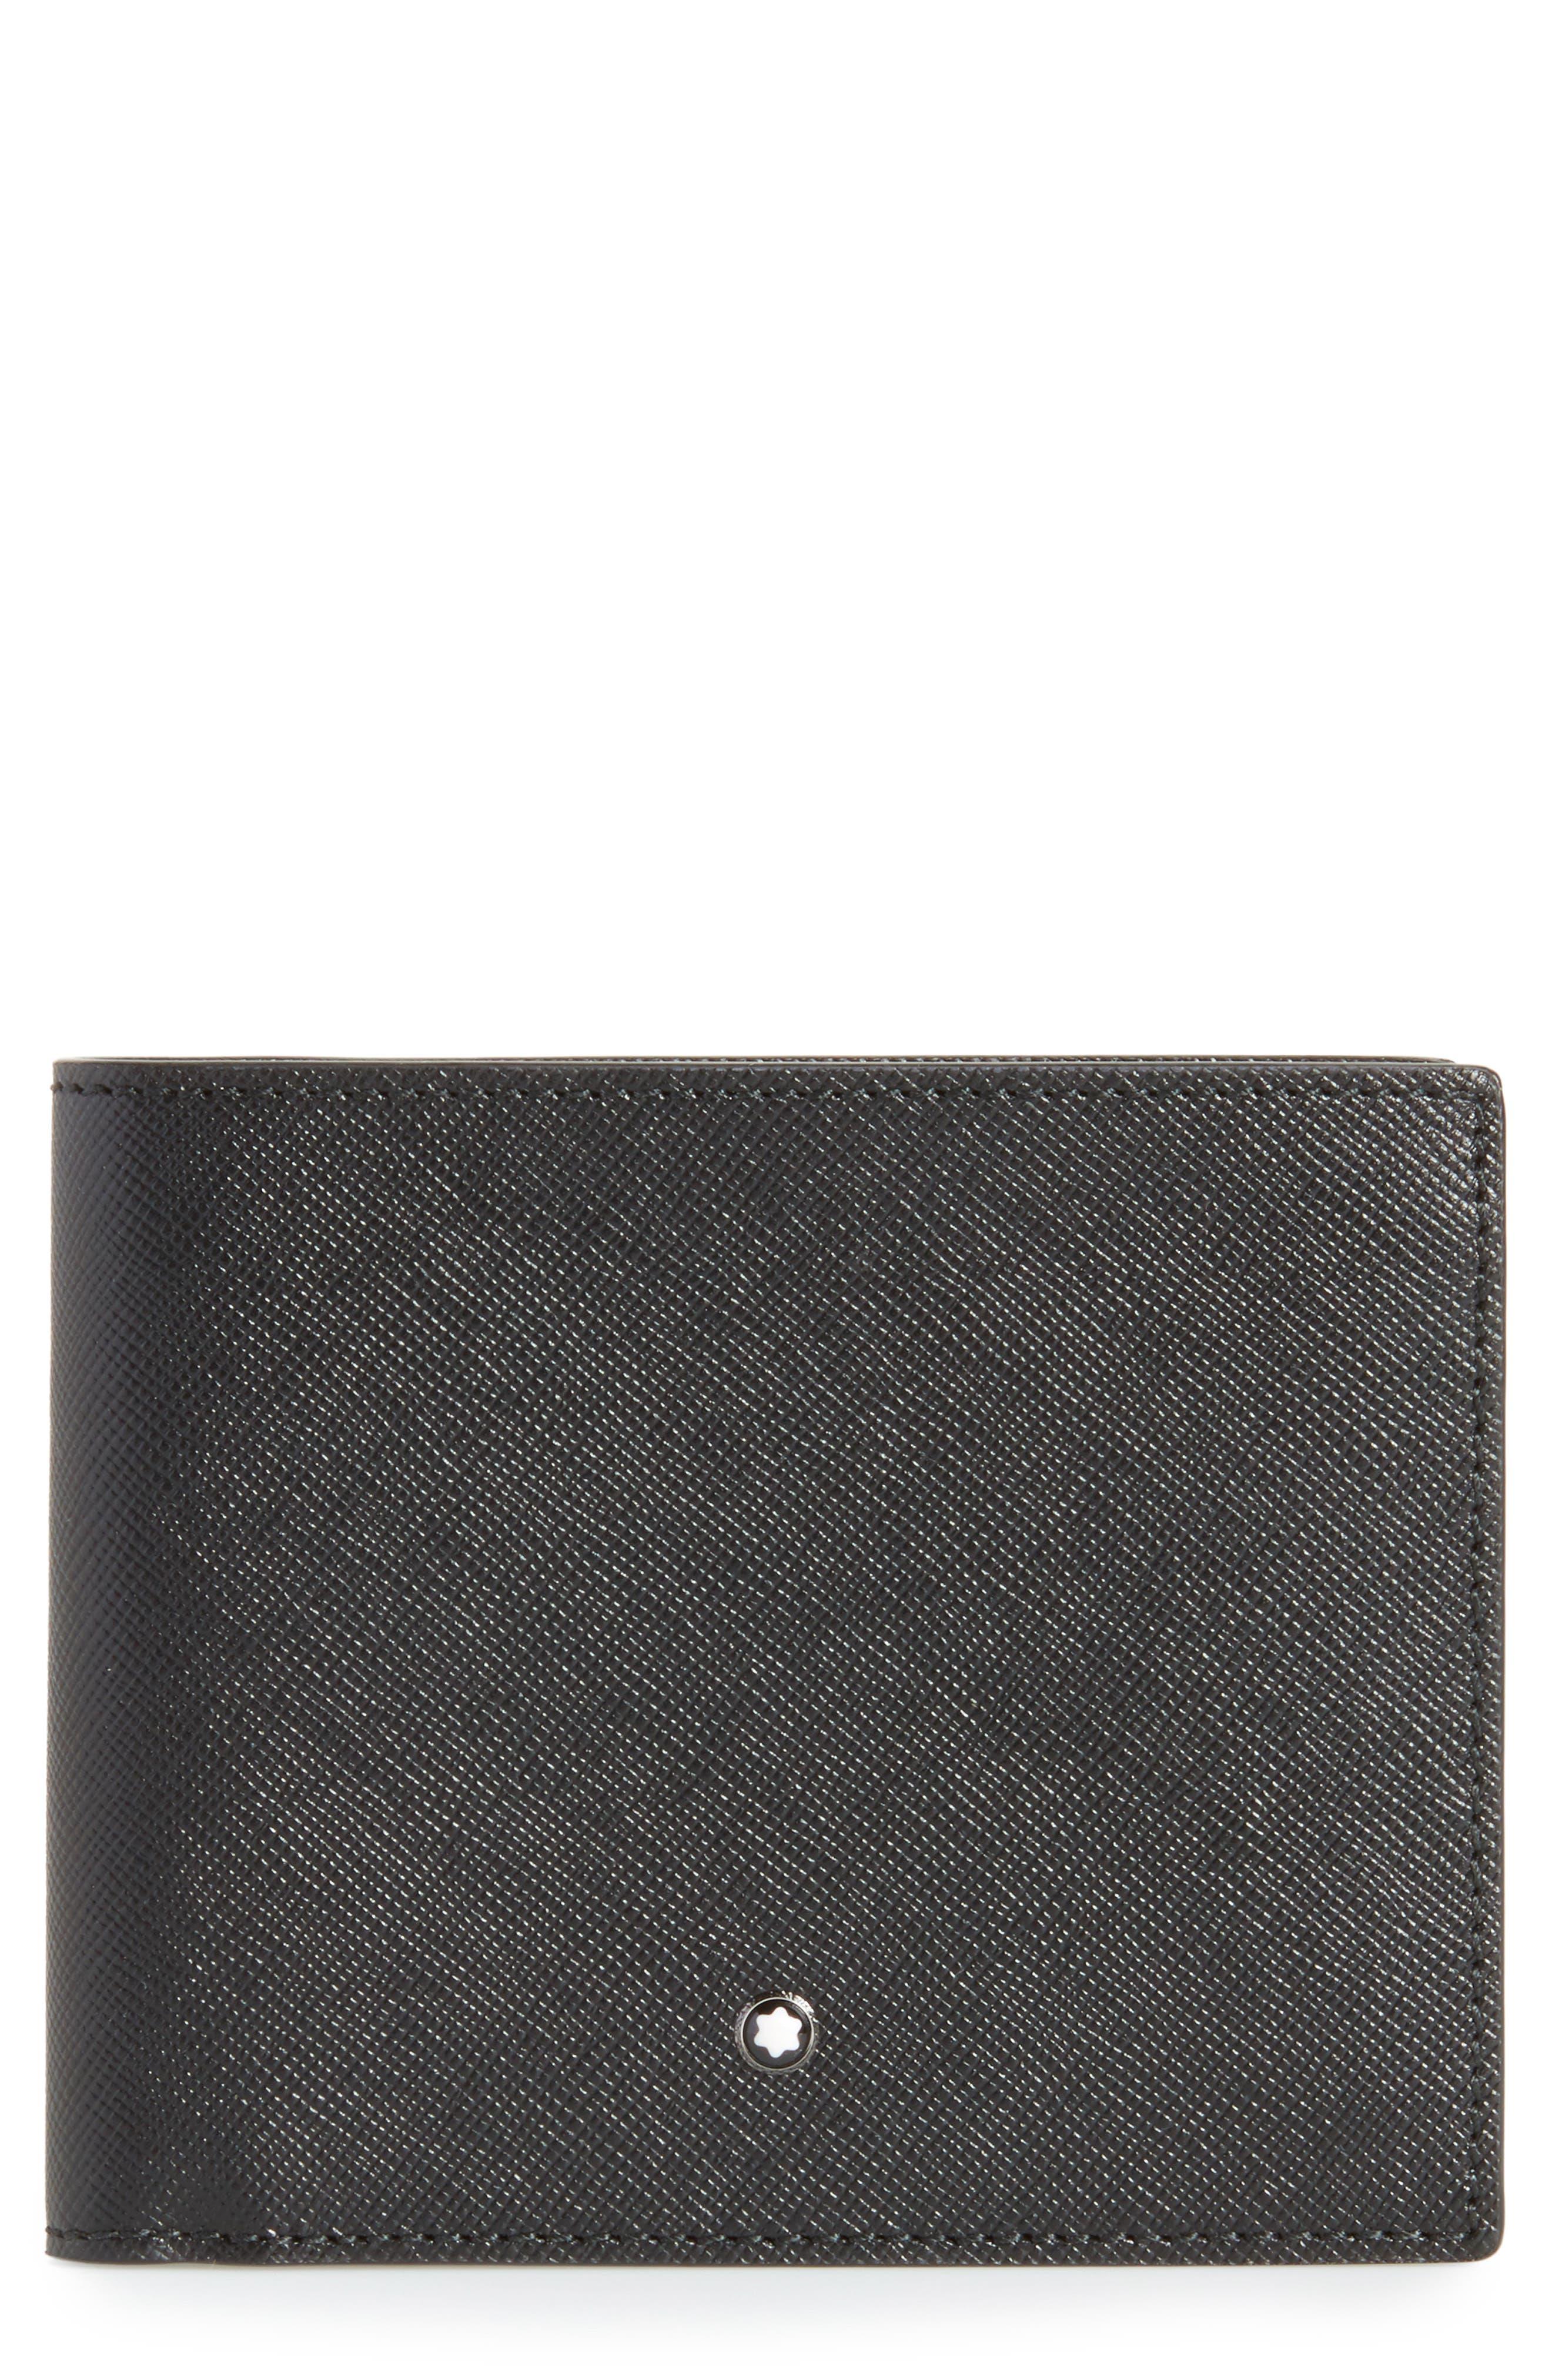 Sartorial Leather Wallet,                         Main,                         color, BLACK